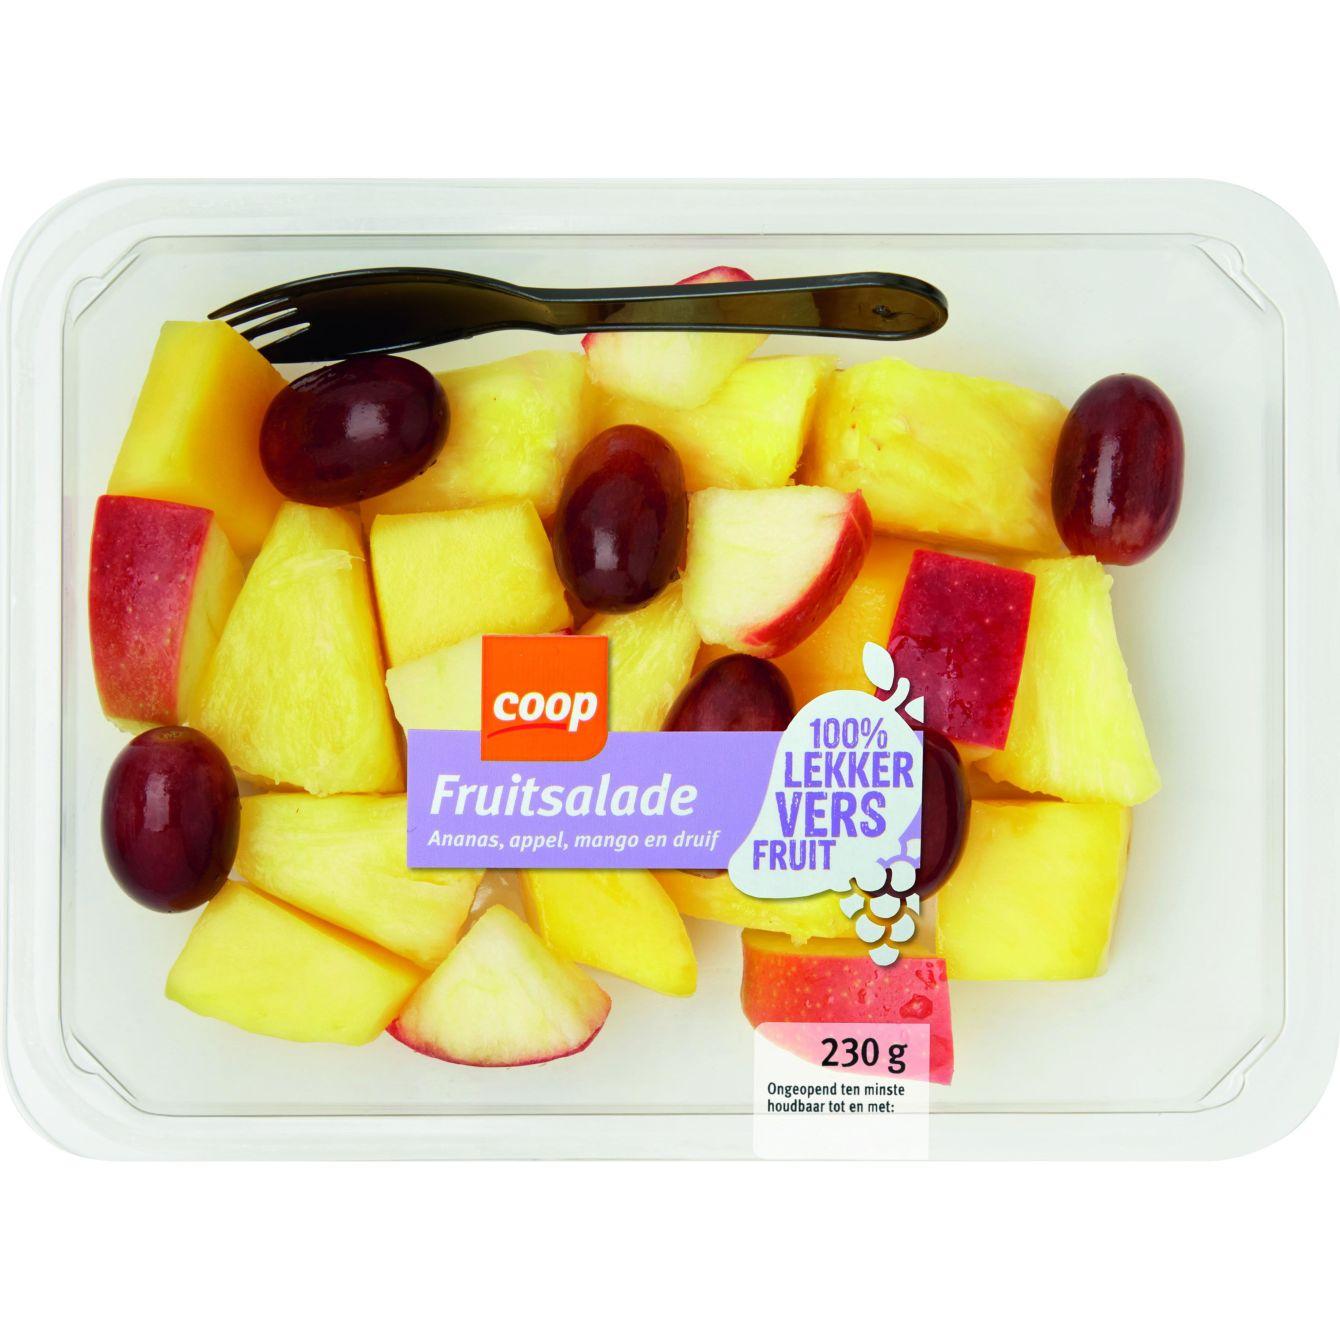 Fruitsalade Mango Appel